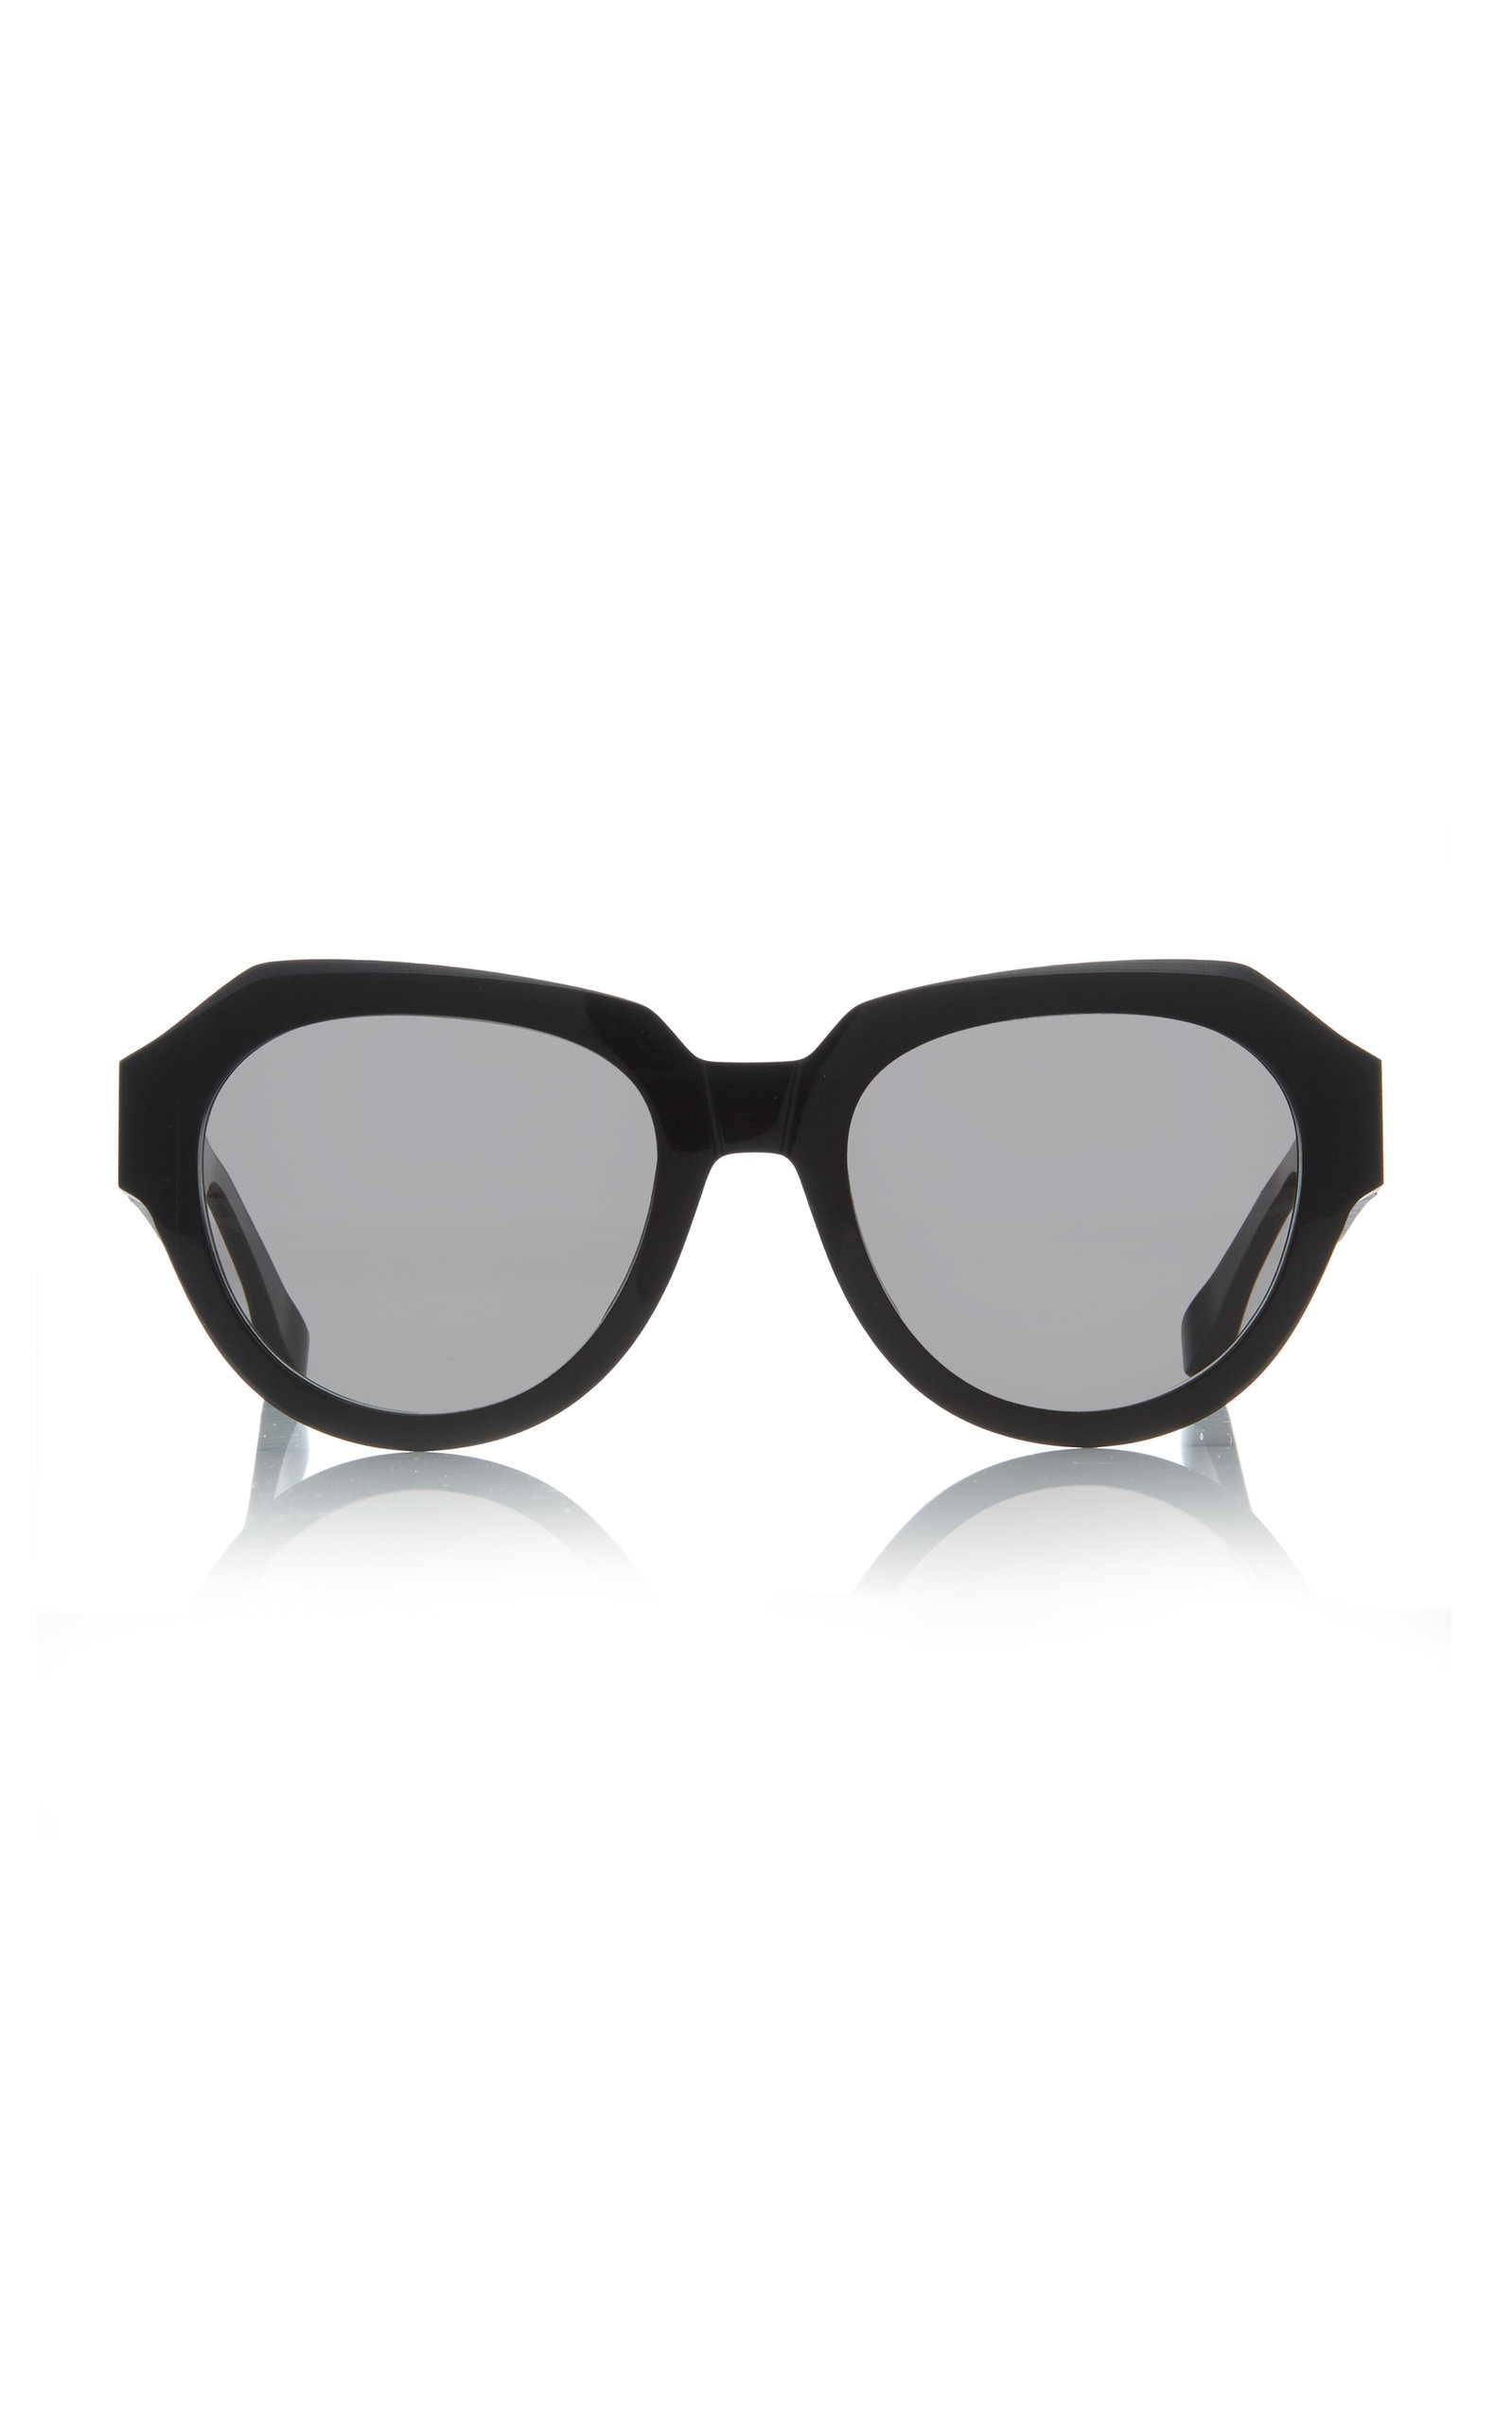 Acetate In Round Black Frame Sunglasses 6mvbfgYyI7